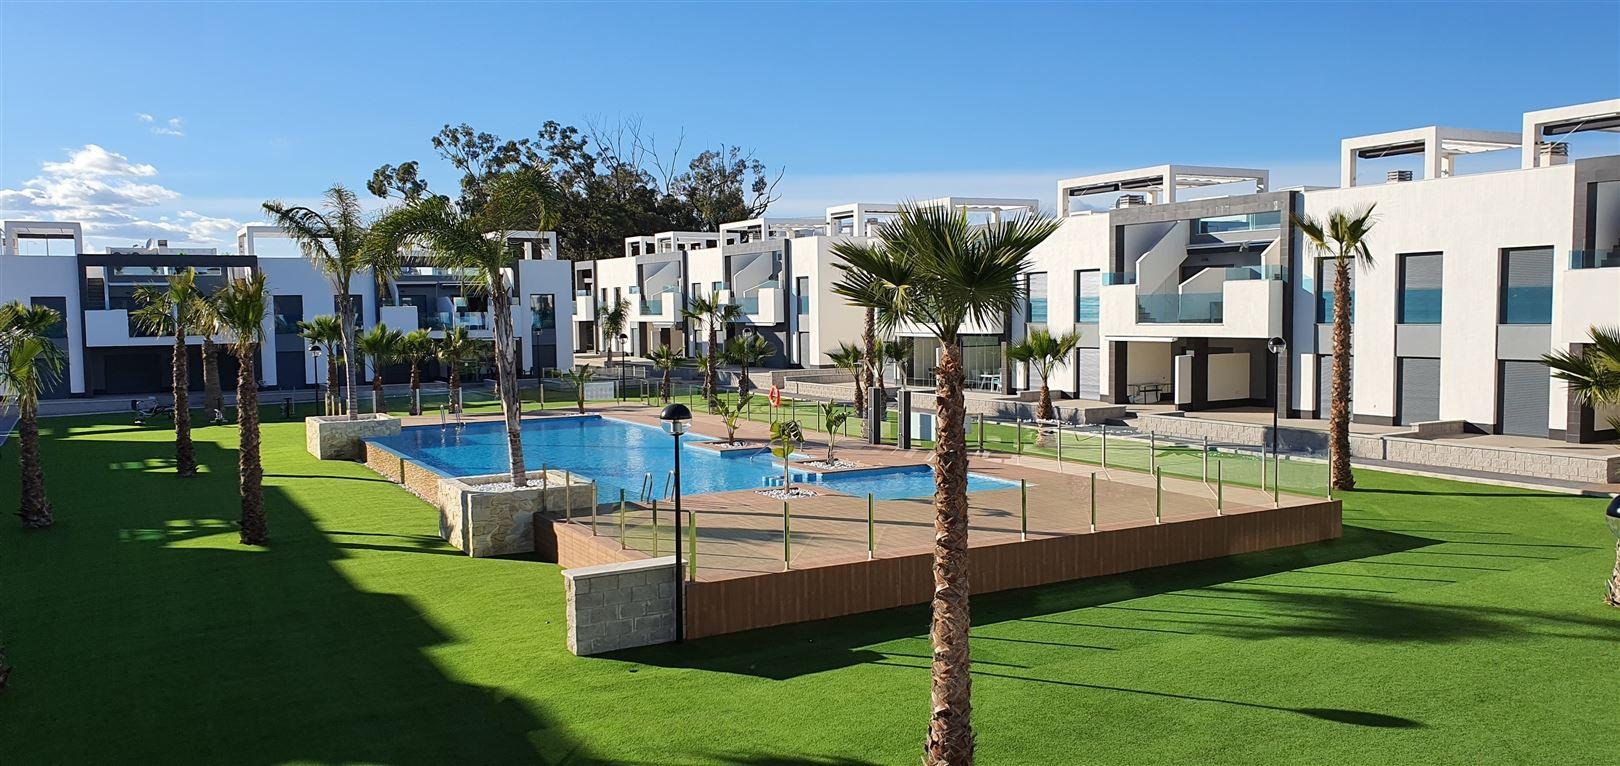 Foto 1 : Appartement te  GUARDAMAR (Spanje) - Prijs € 184.900